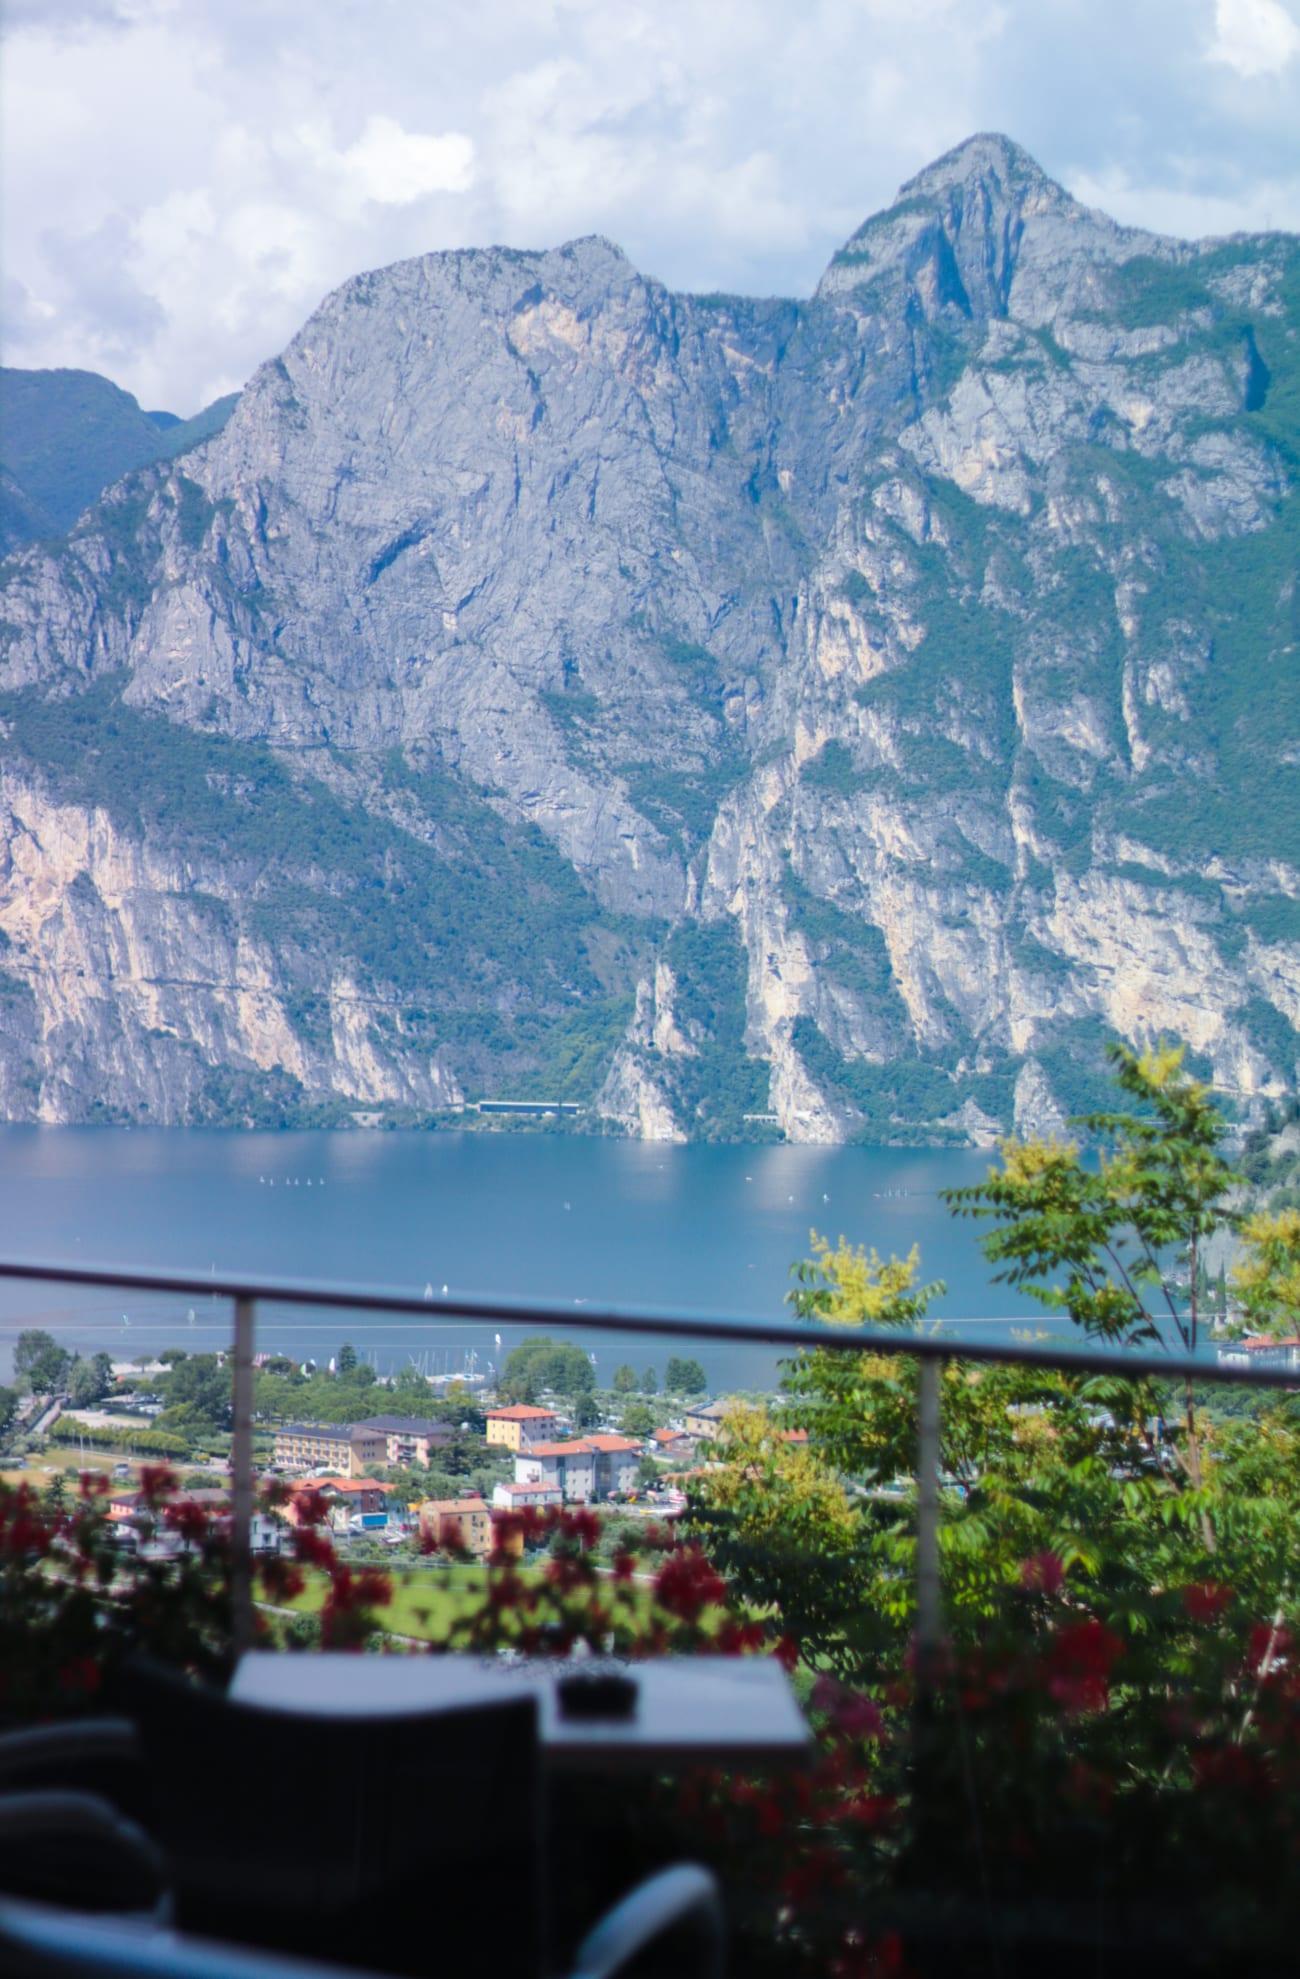 hotel forte charme pareri opinions review italia blogger blog trabel romania roxi rose luxury blog (23)